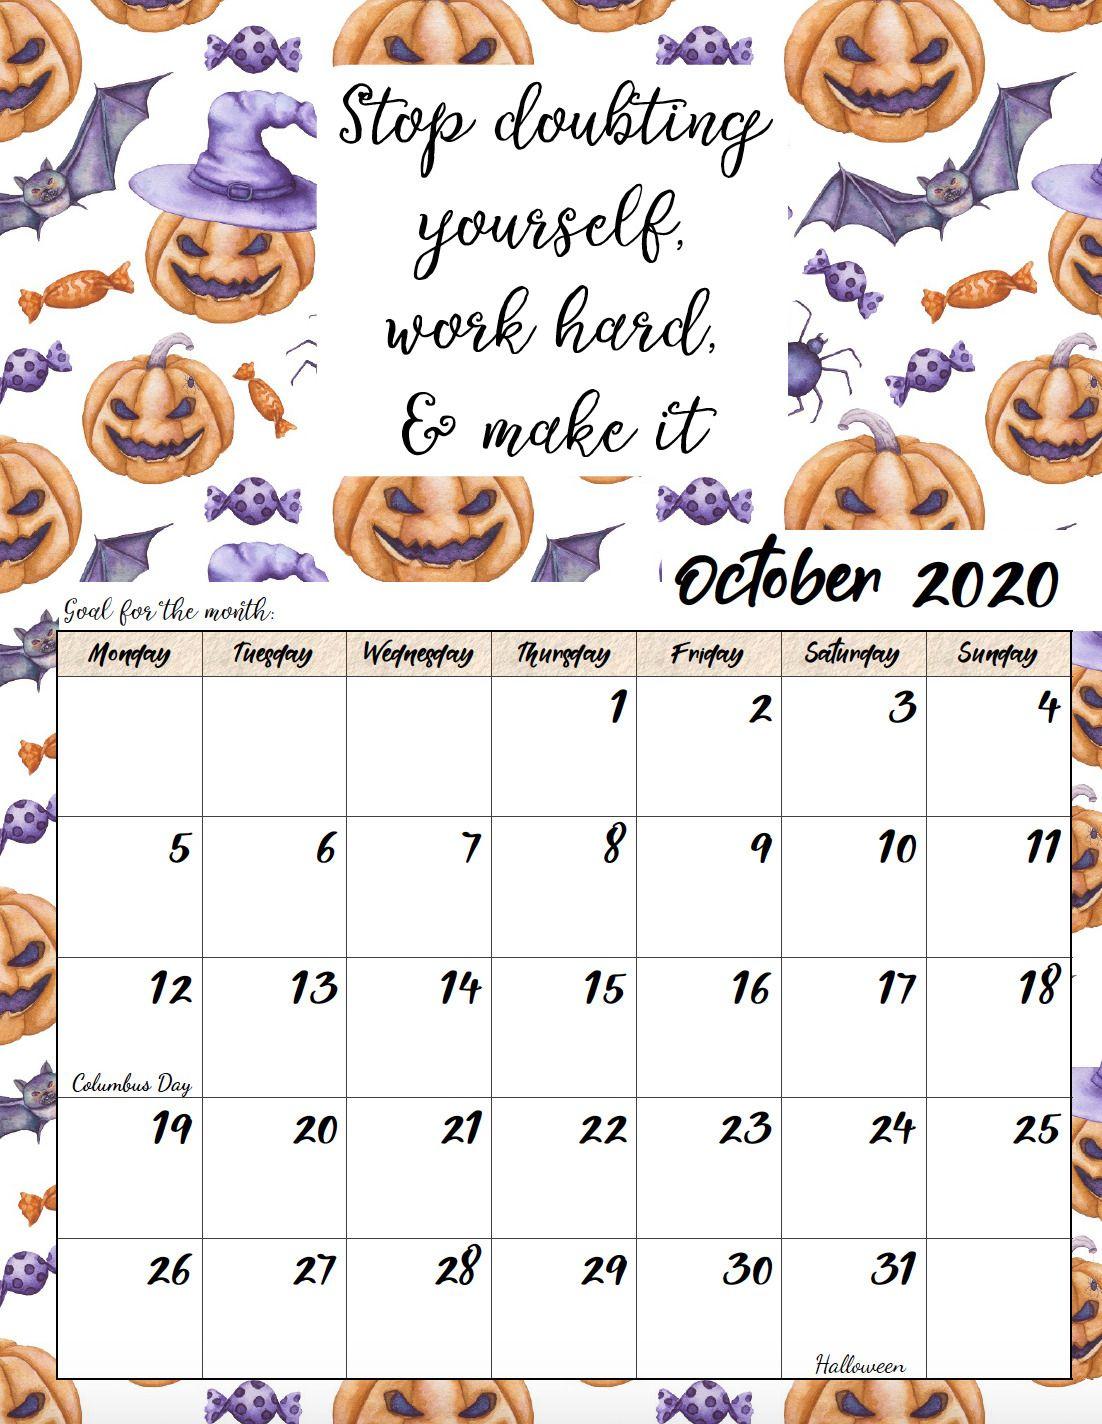 Free Printable 2020 Monday Start Monthly Motivational Calendars   Diy Calendar Free Printables